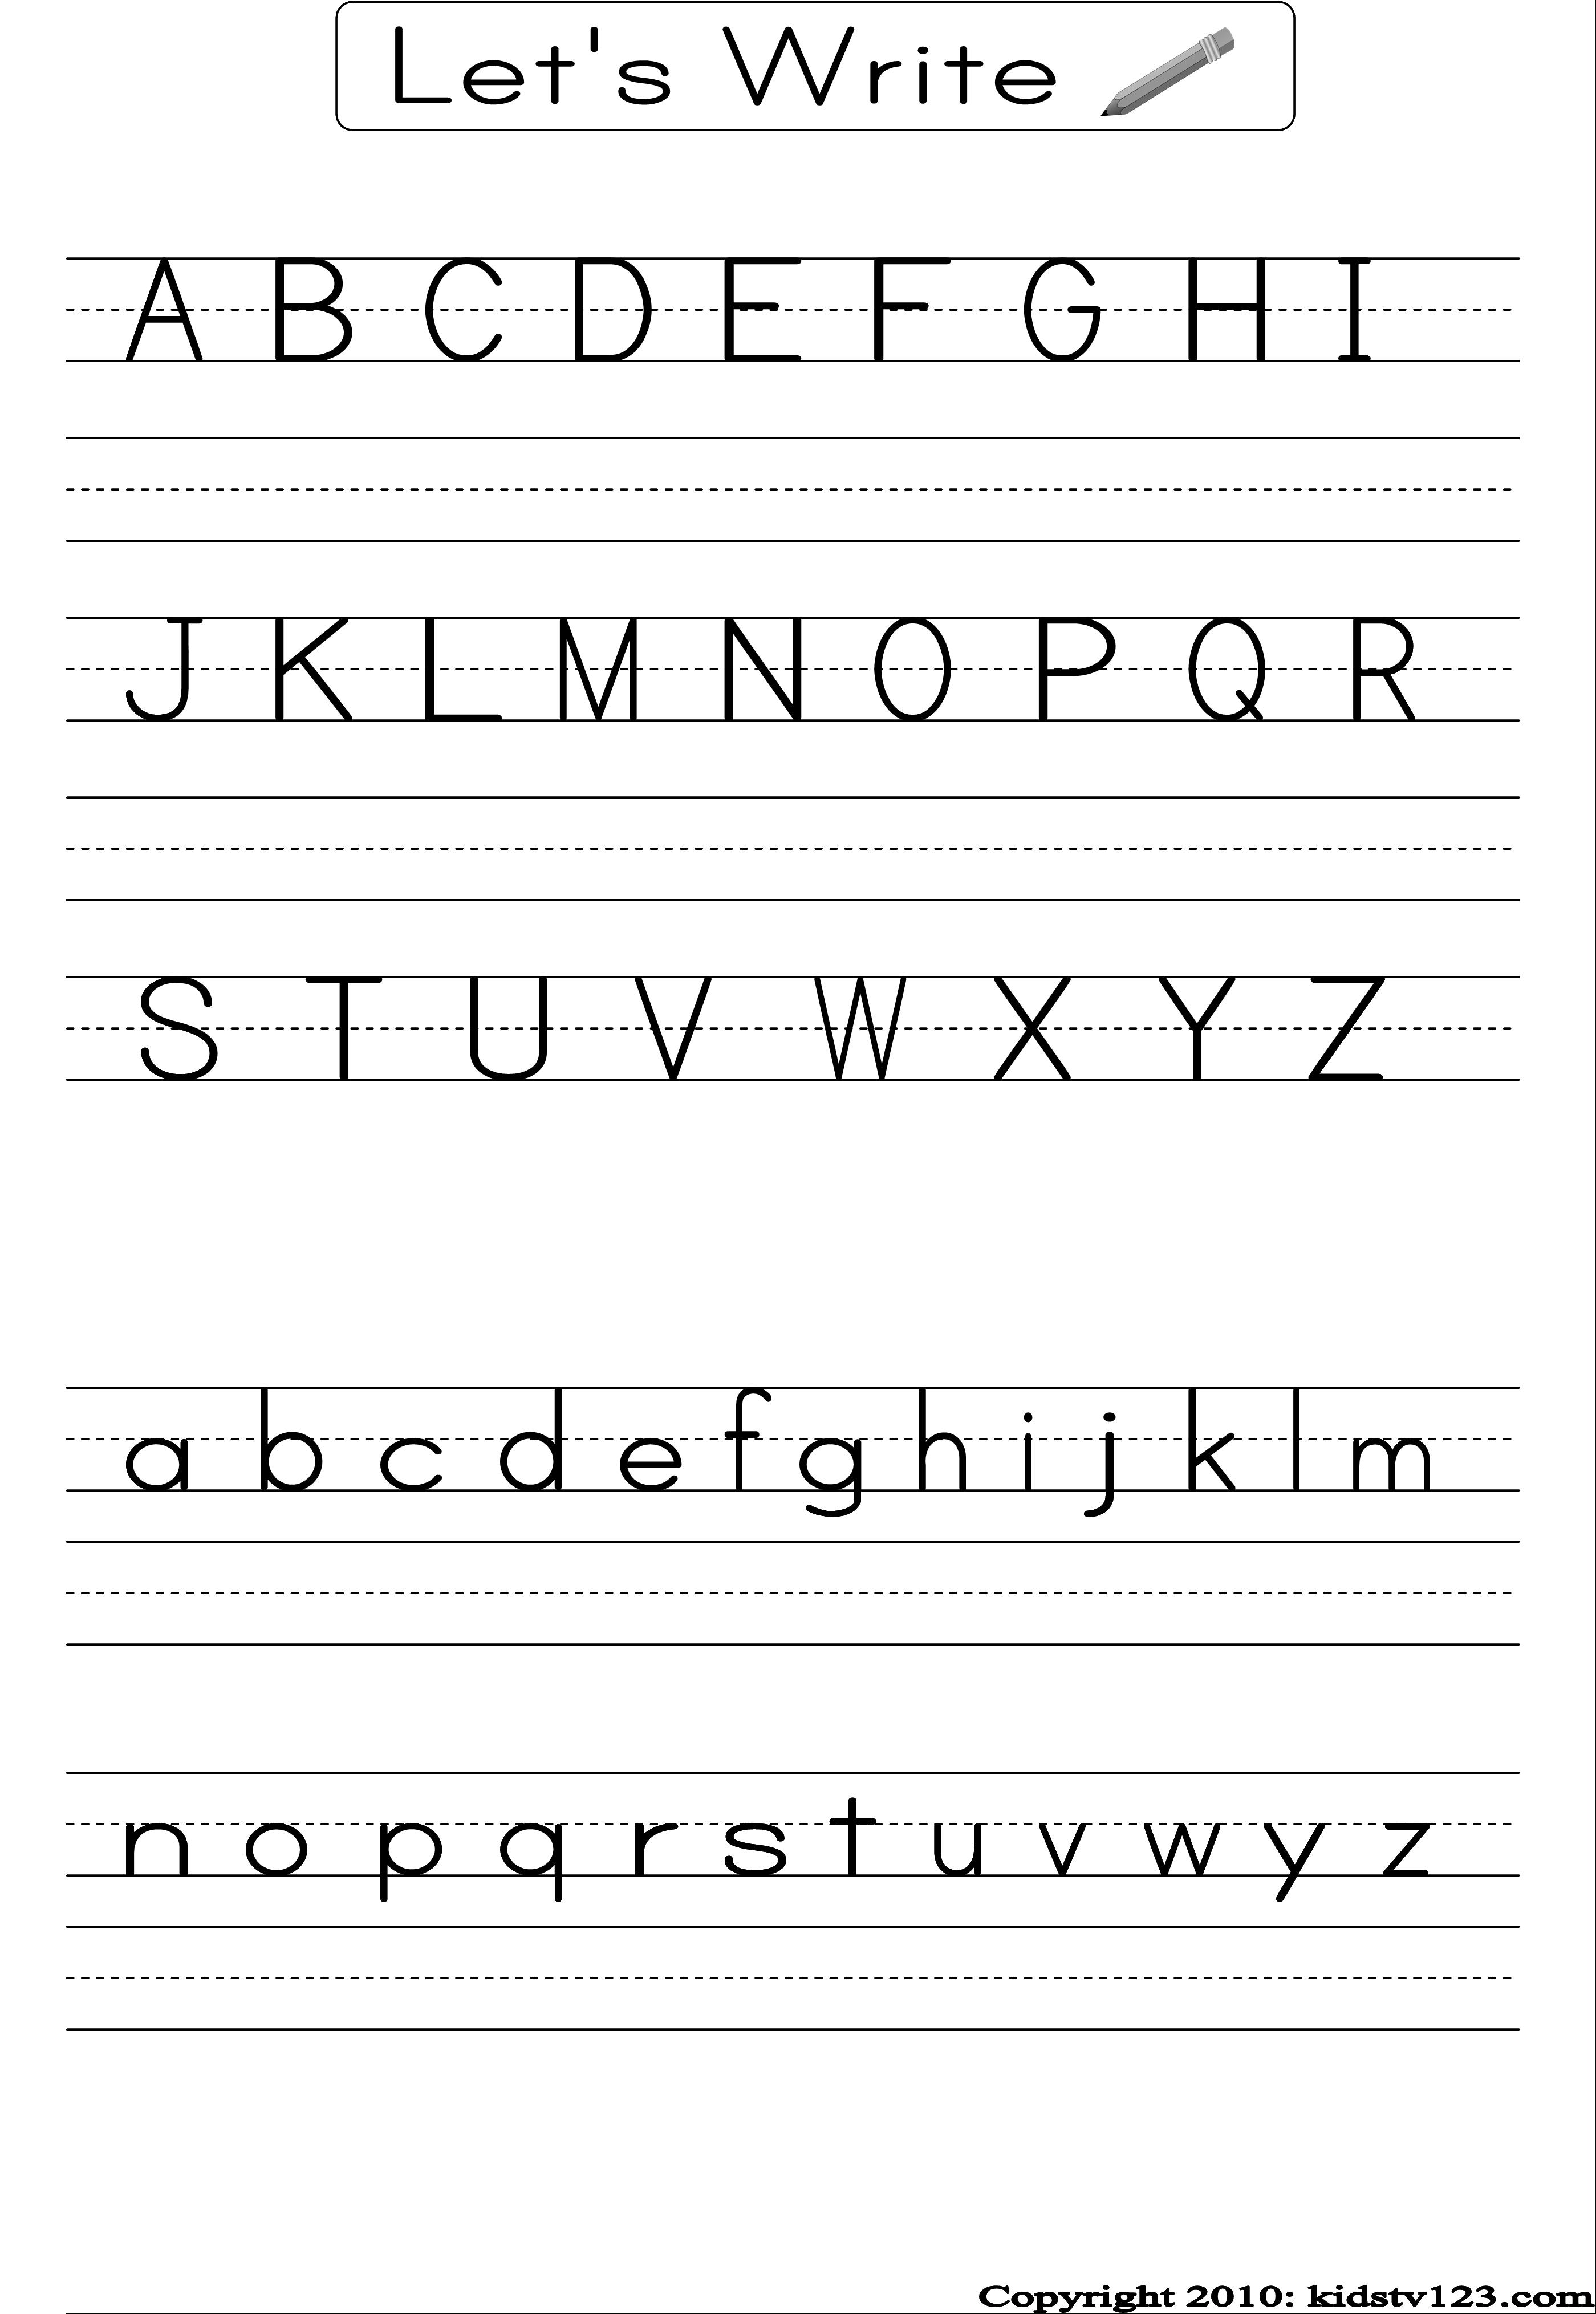 Alphabet Writing Practice Sheet | Edu-Fun | Alphabet Worksheets | Free Printable Alphabet Worksheets